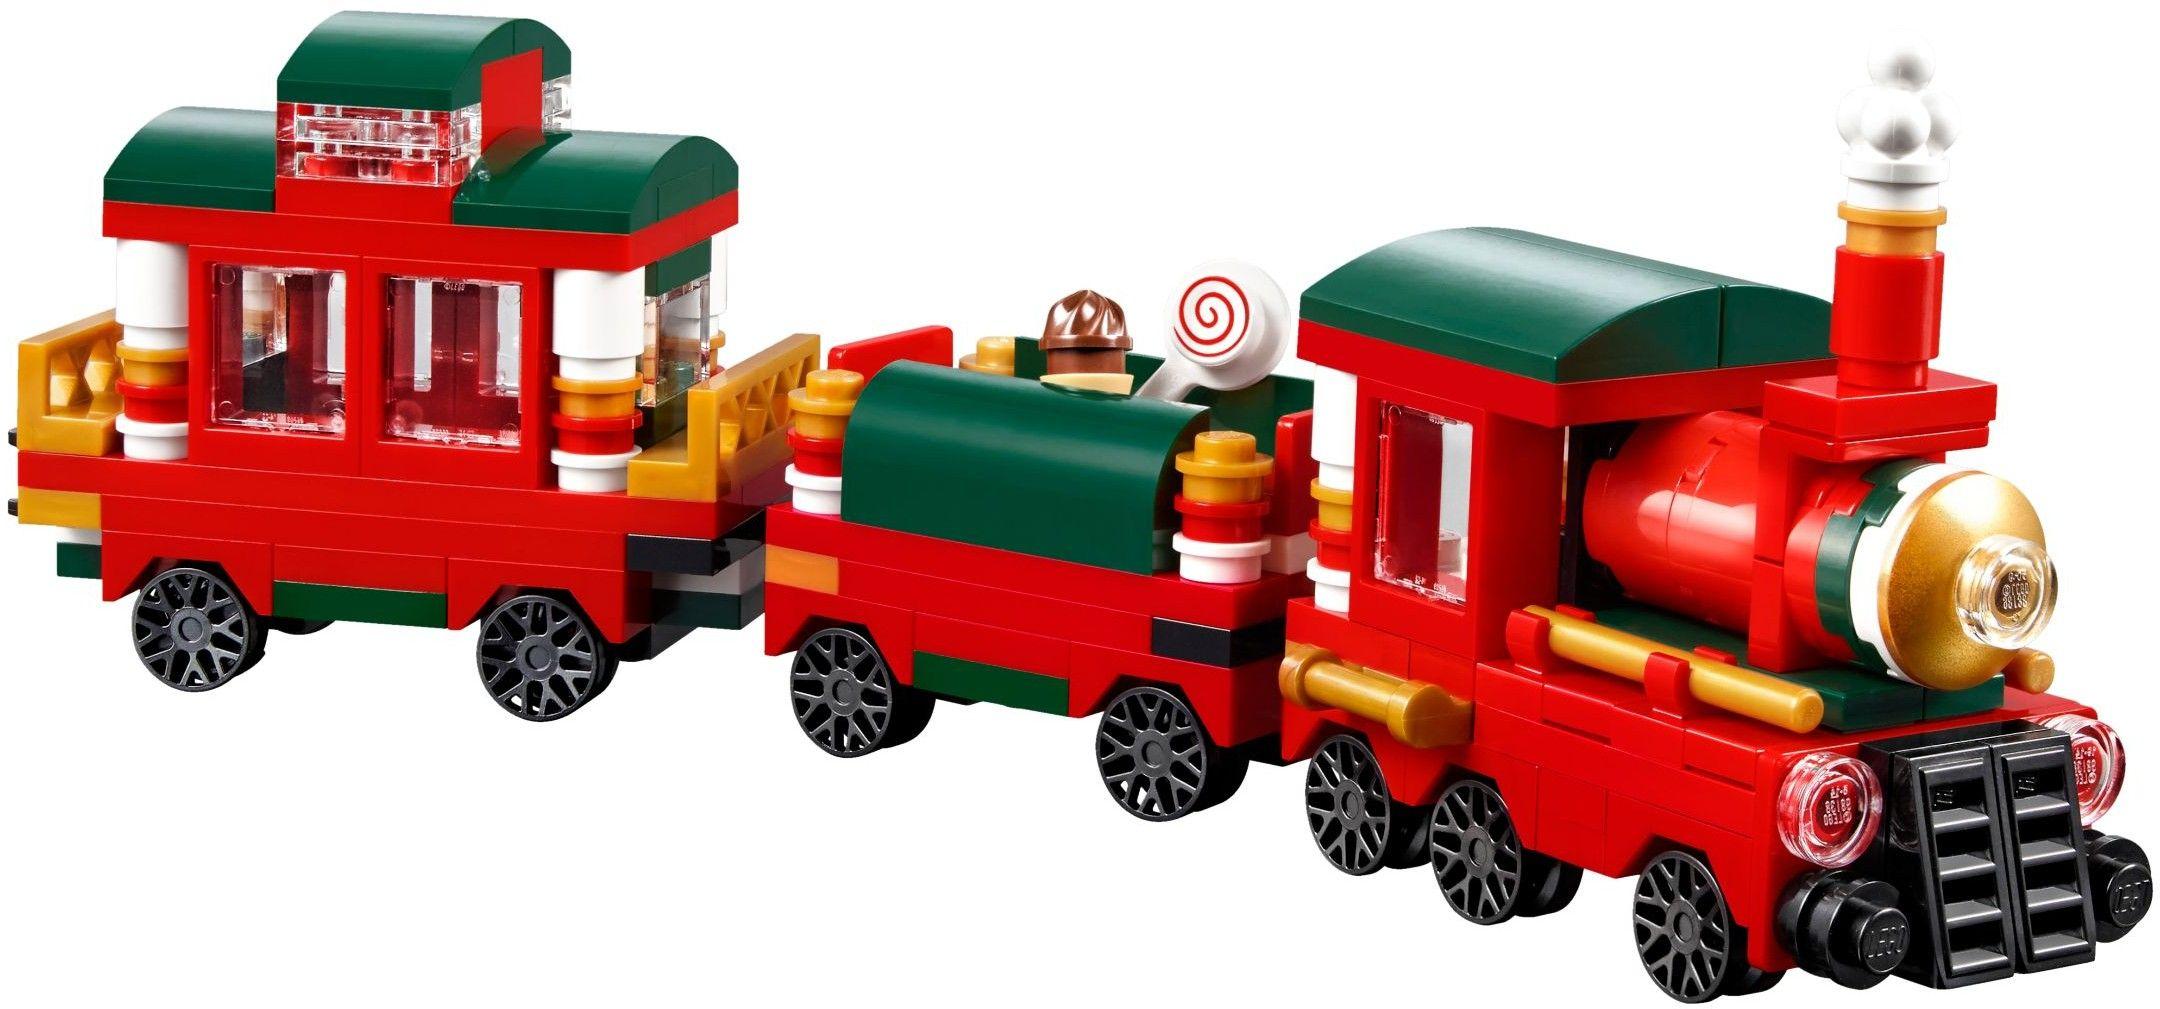 Seasonal | Lego holiday inspiration | Pinterest | Christmas train ...